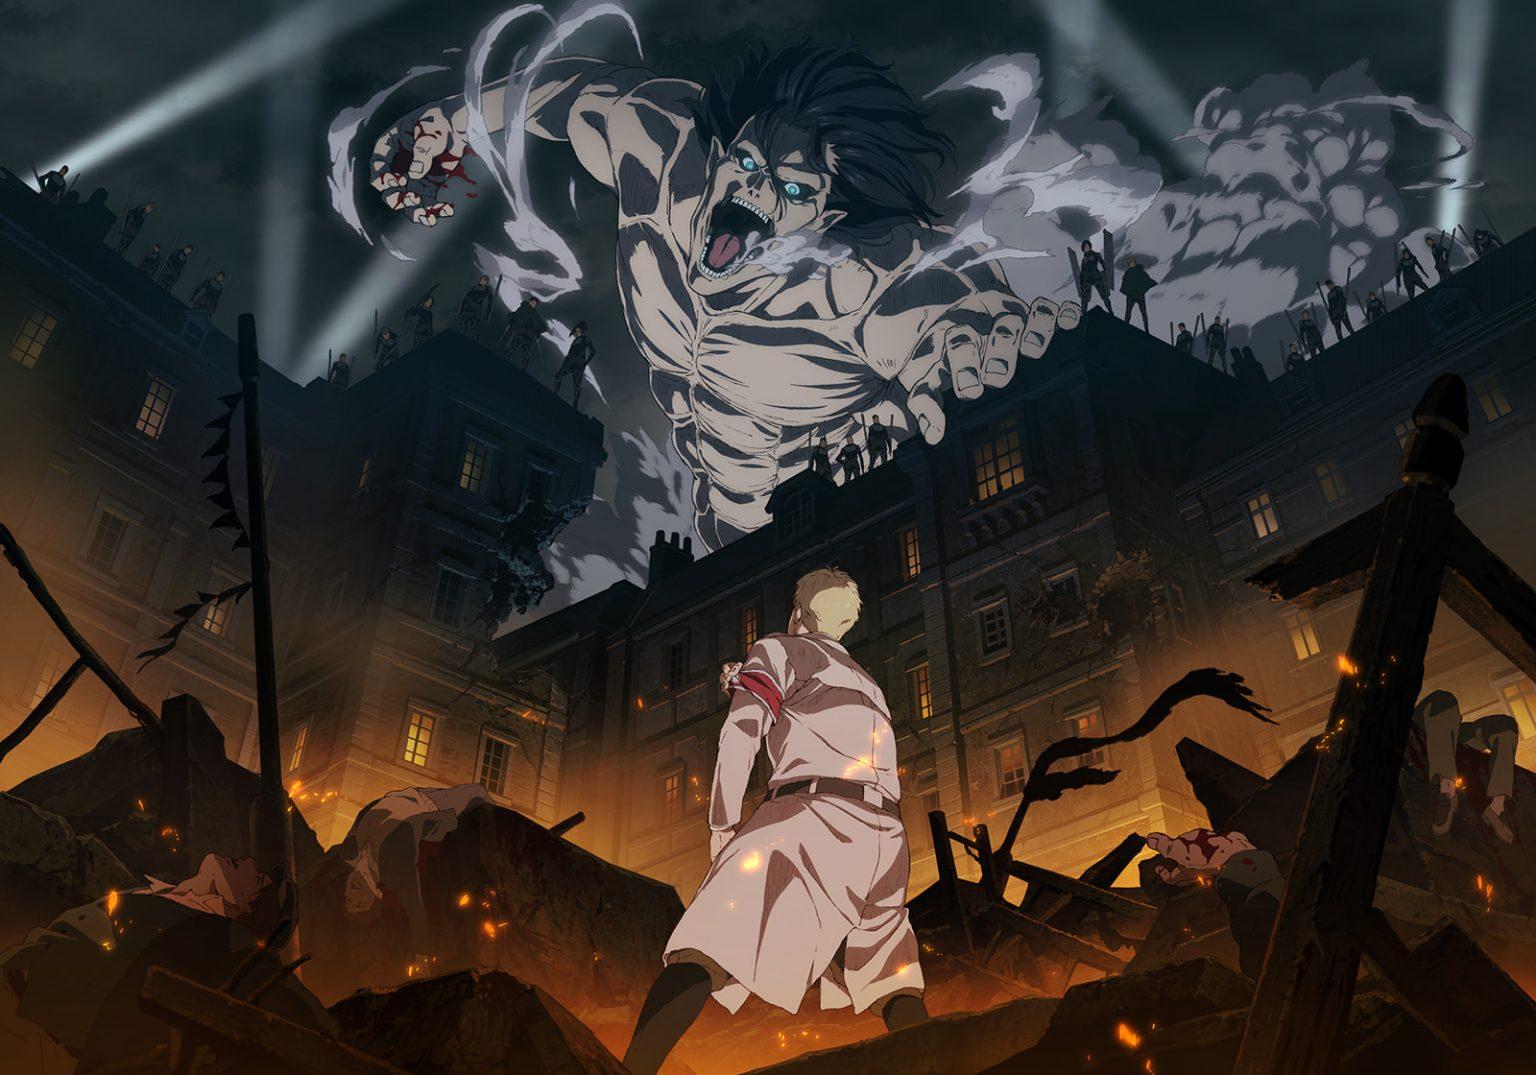 Shingeki no Kyojin Final Season / Discussion dernier épisode. Shingeki-no-Kyojin-The-Final-Season-Saison-4-anime-image-1-1536x1075